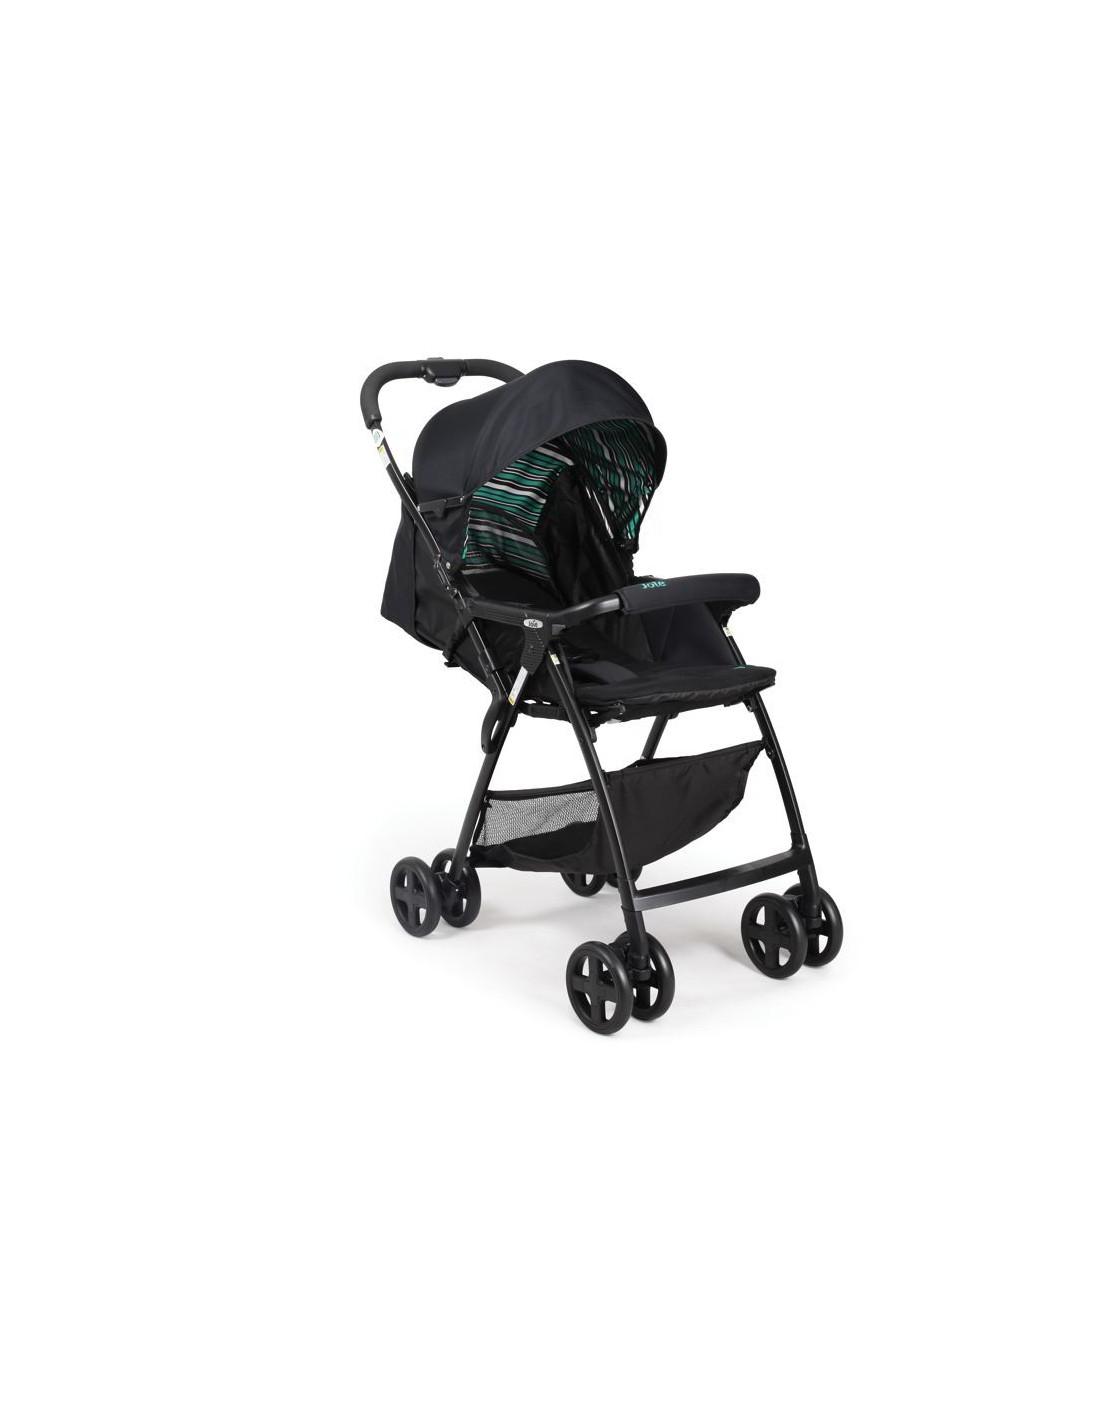 Silla de paseo ligera aire lite de joie baby - Alcampo sillas de paseo ...